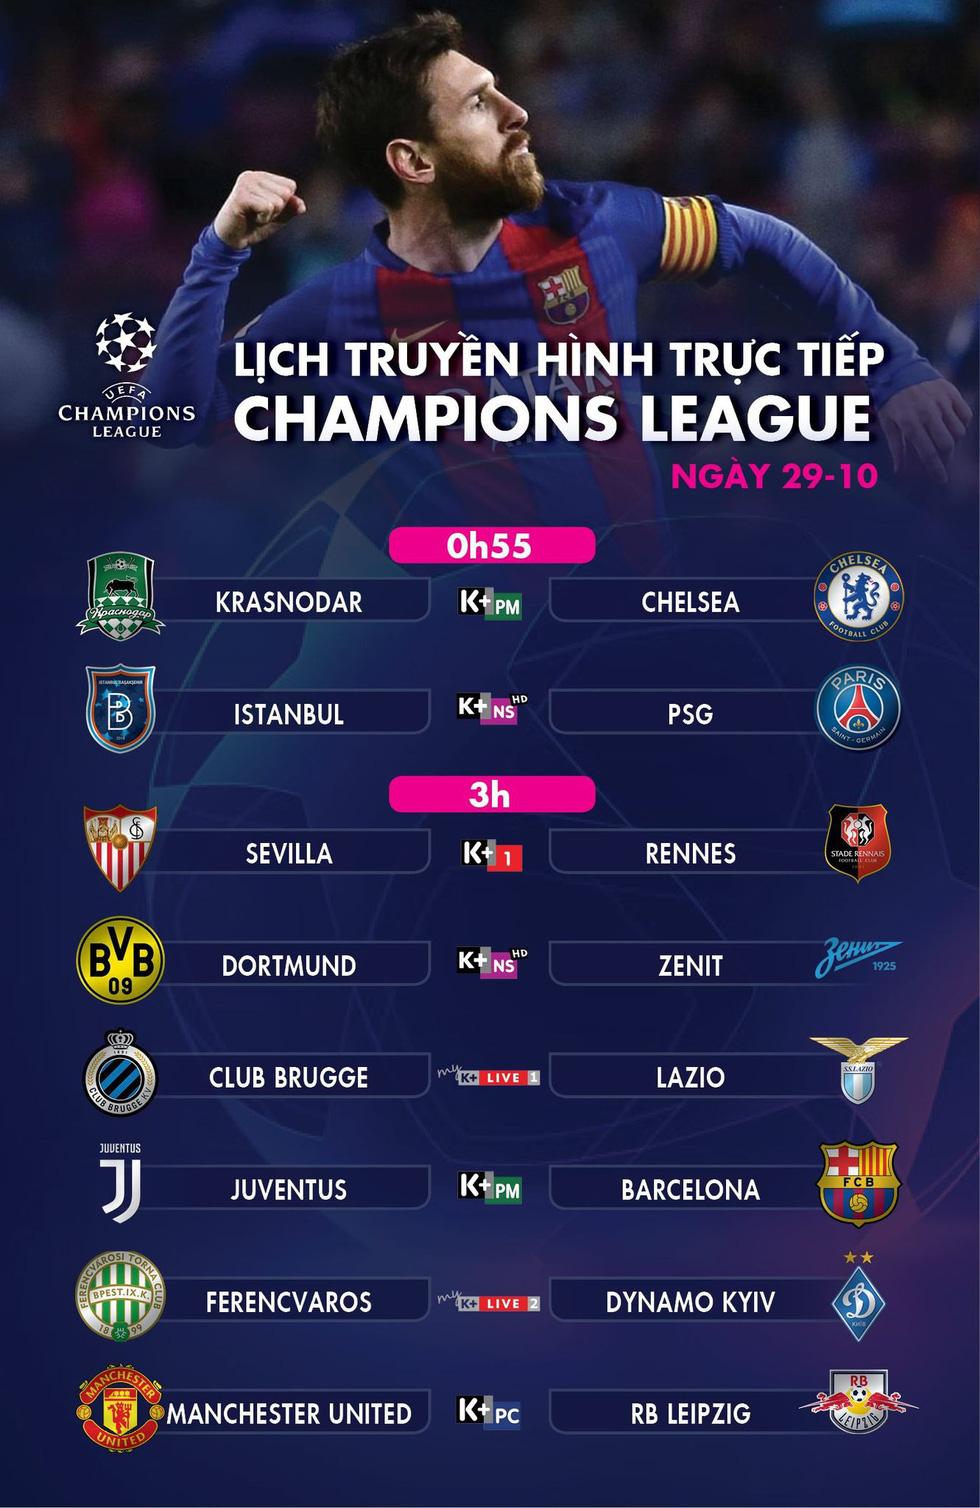 Lịch trực tiếp Champions League 29-10: Juventus gặp Barca - Ảnh 1.